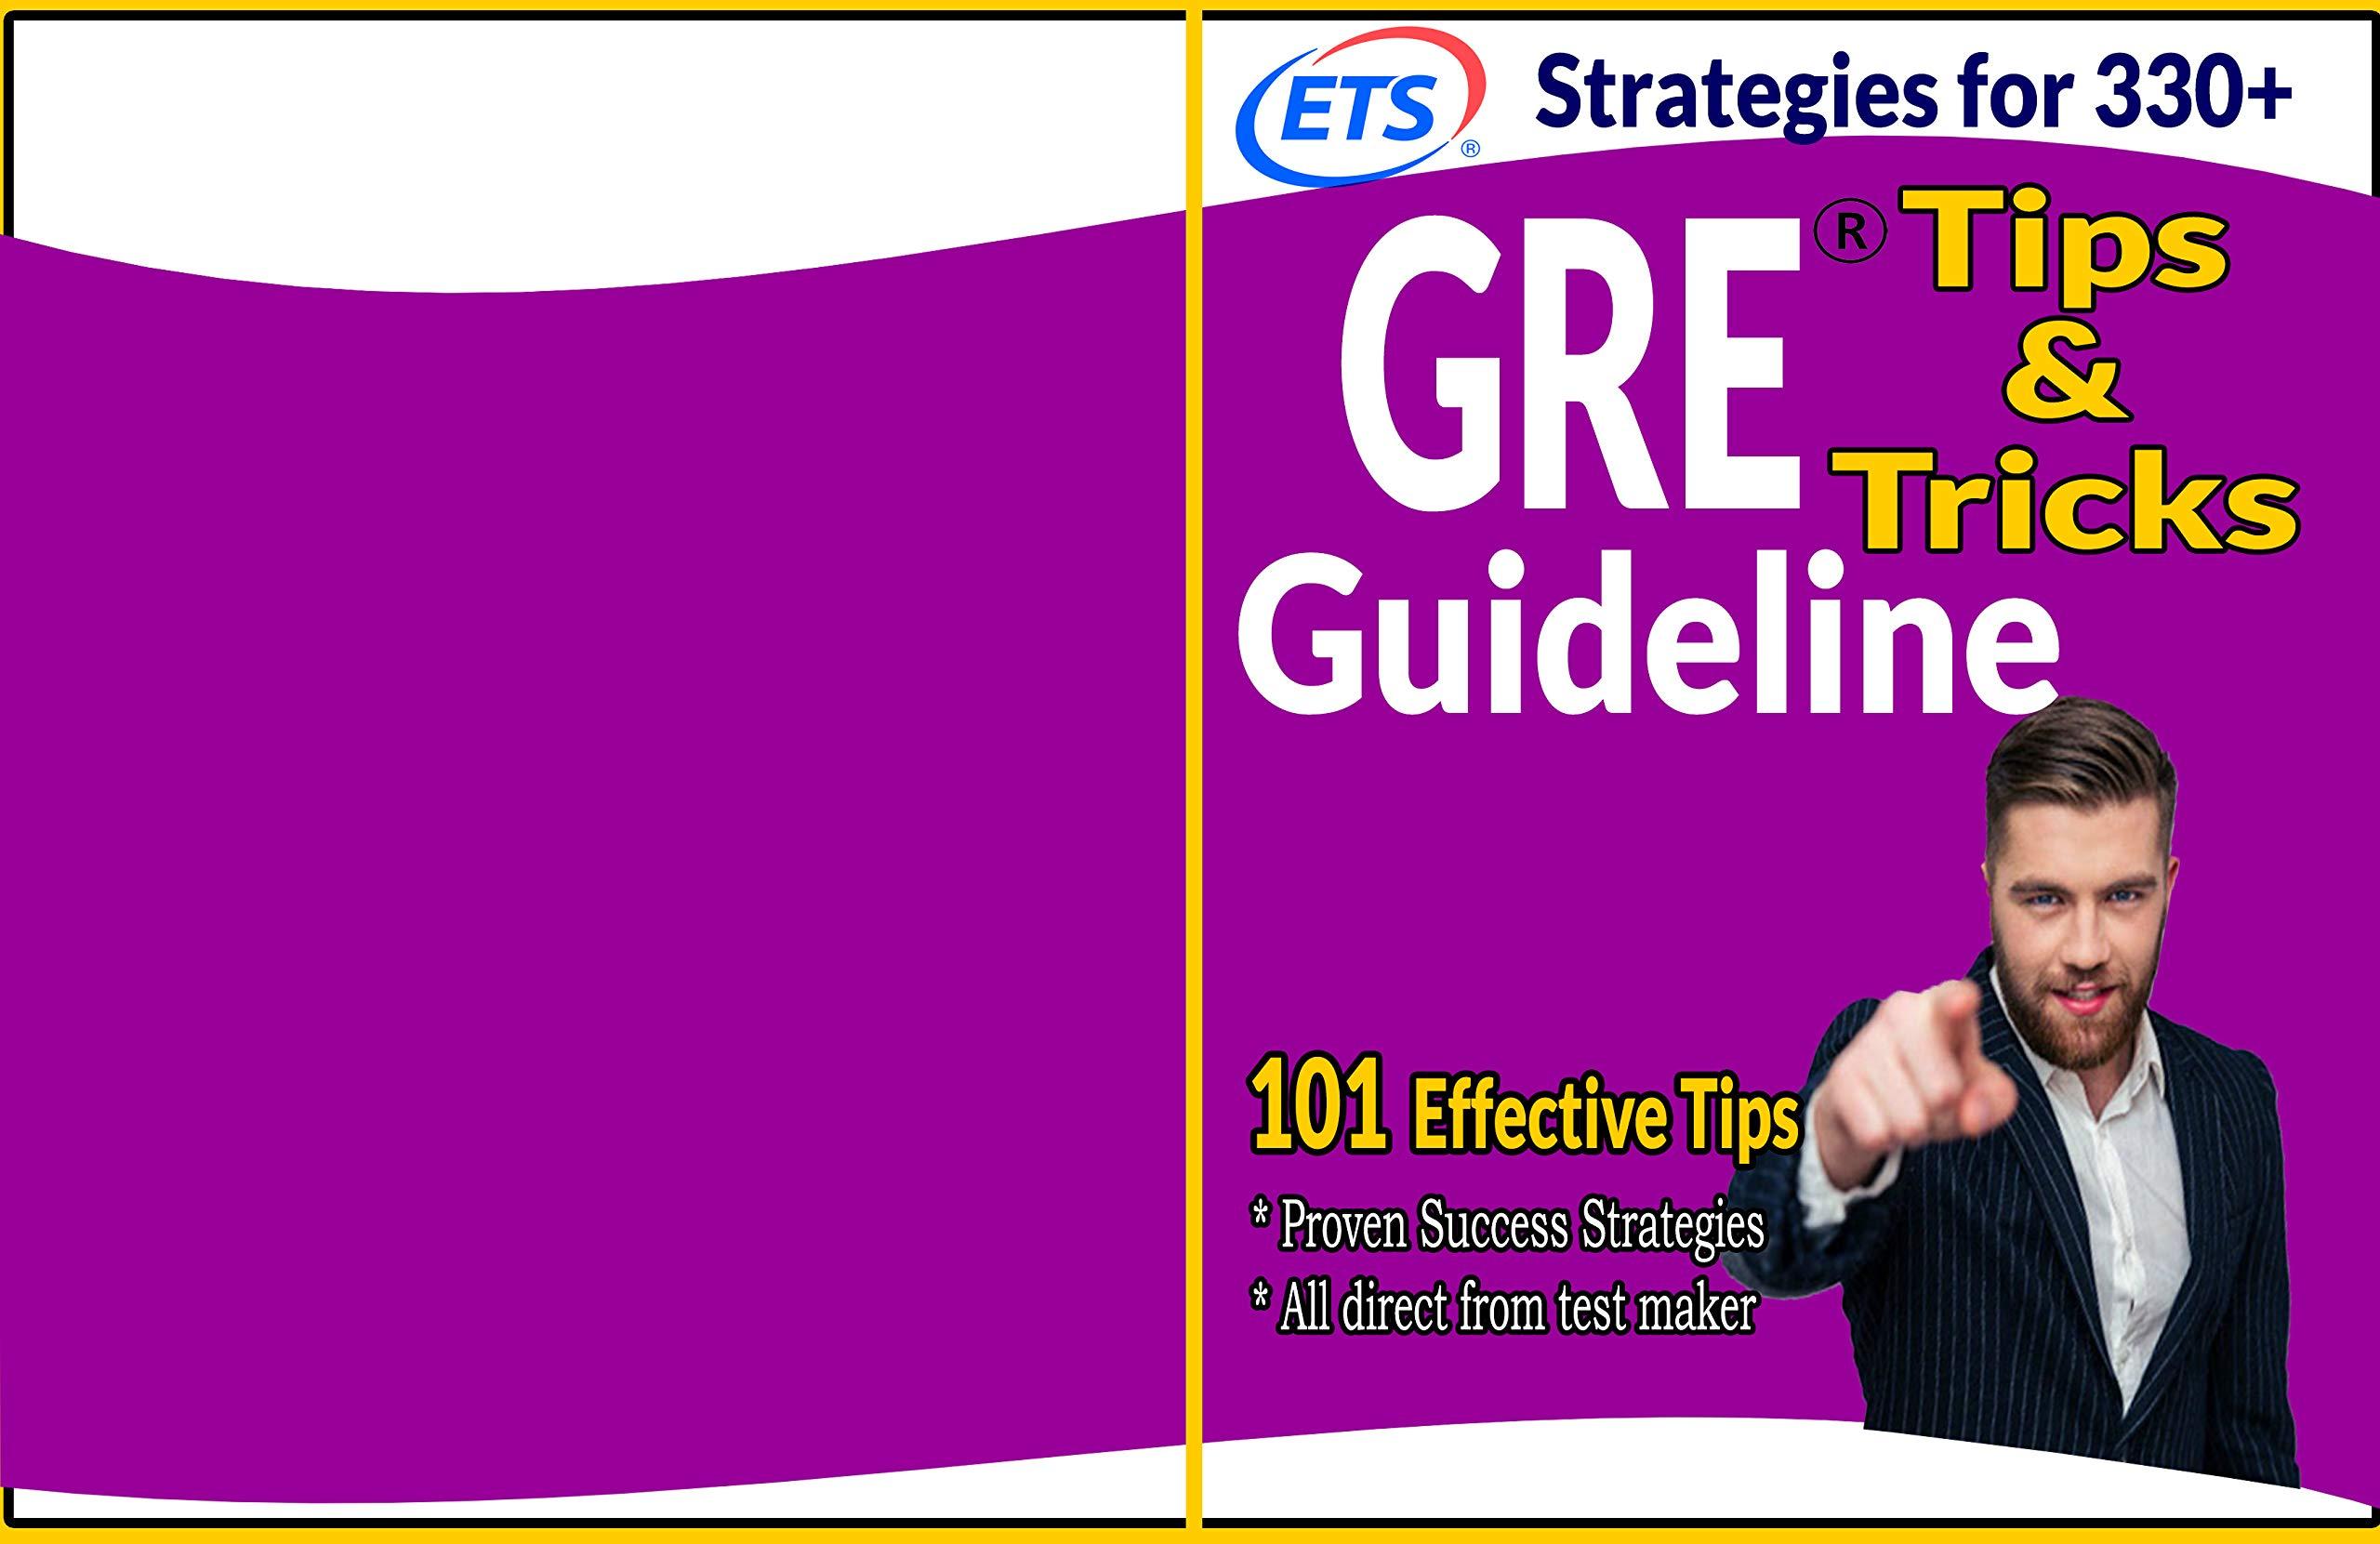 GRE Tips & Tricks: GRE Guideline